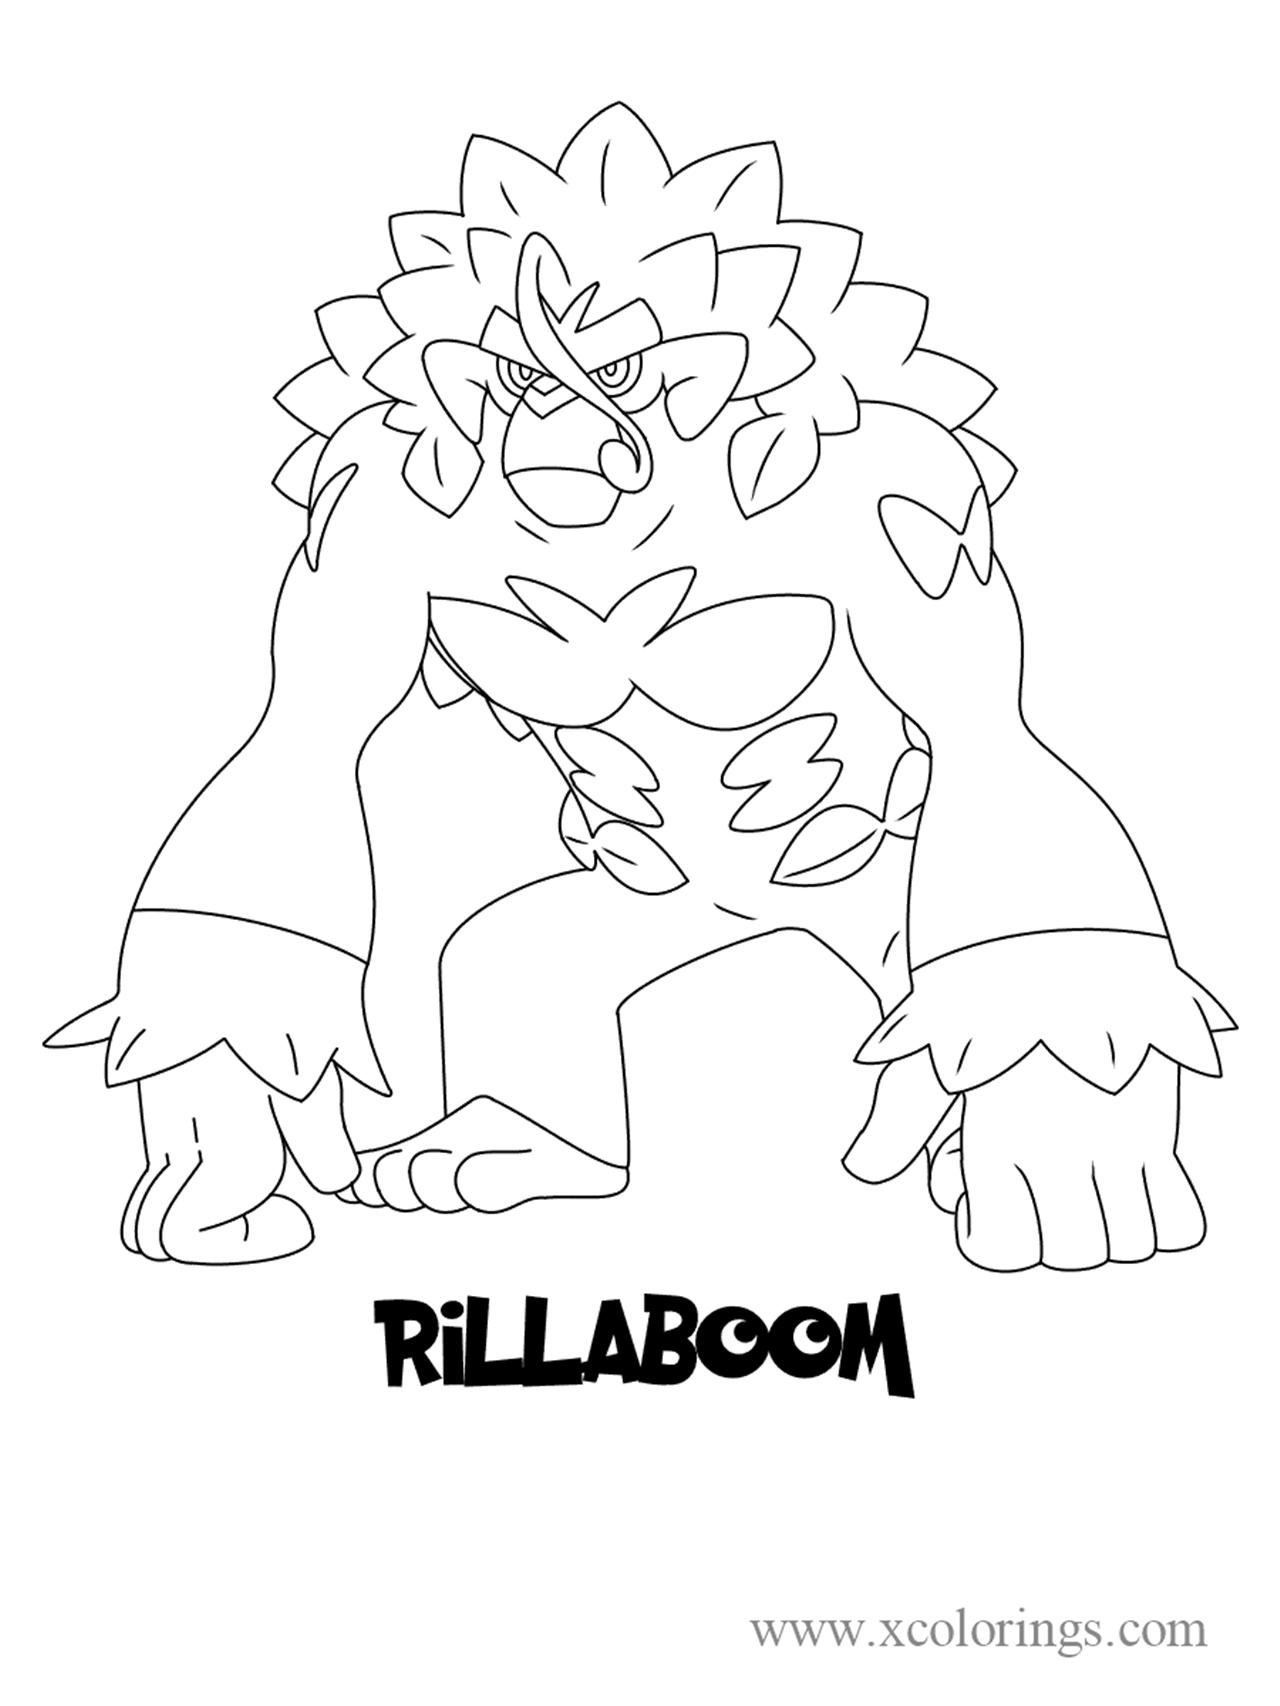 Pokemon Sword And Shield Rillaboom Coloring Pages Pokemon Coloring Pages Pokemon Coloring Sheets Easy Pokemon Drawings